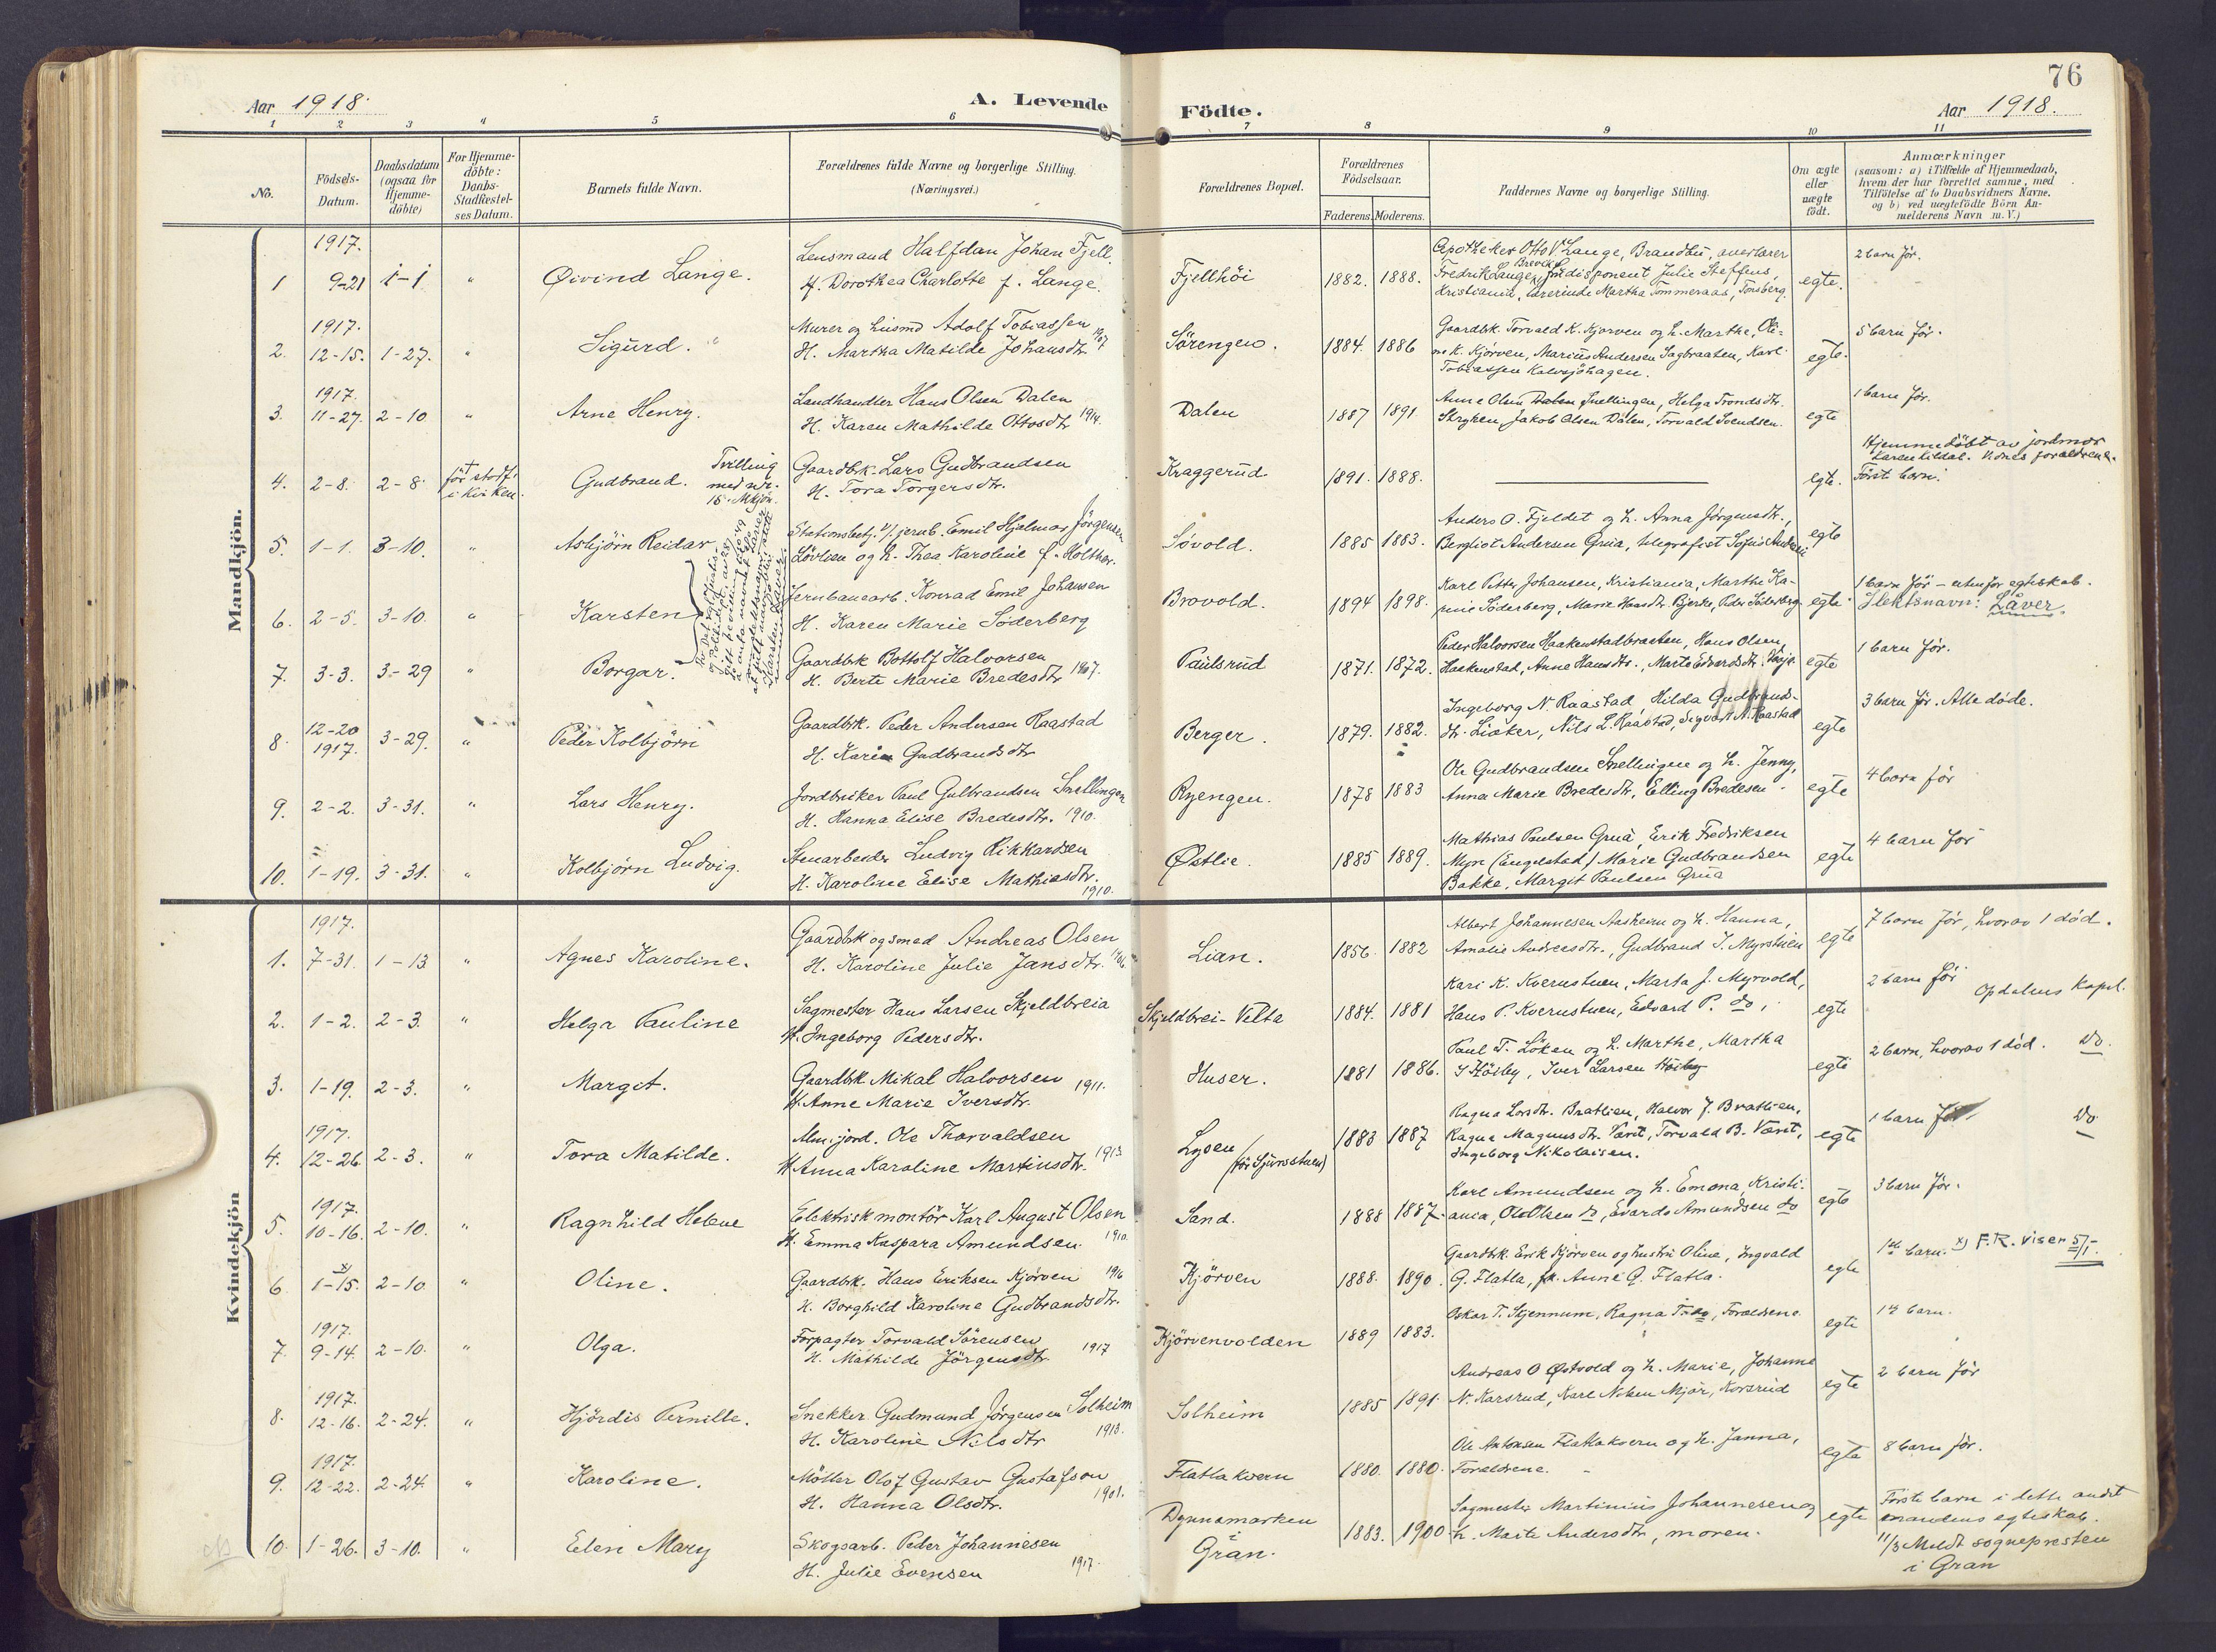 SAH, Lunner prestekontor, H/Ha/Haa/L0001: Ministerialbok nr. 1, 1907-1922, s. 76